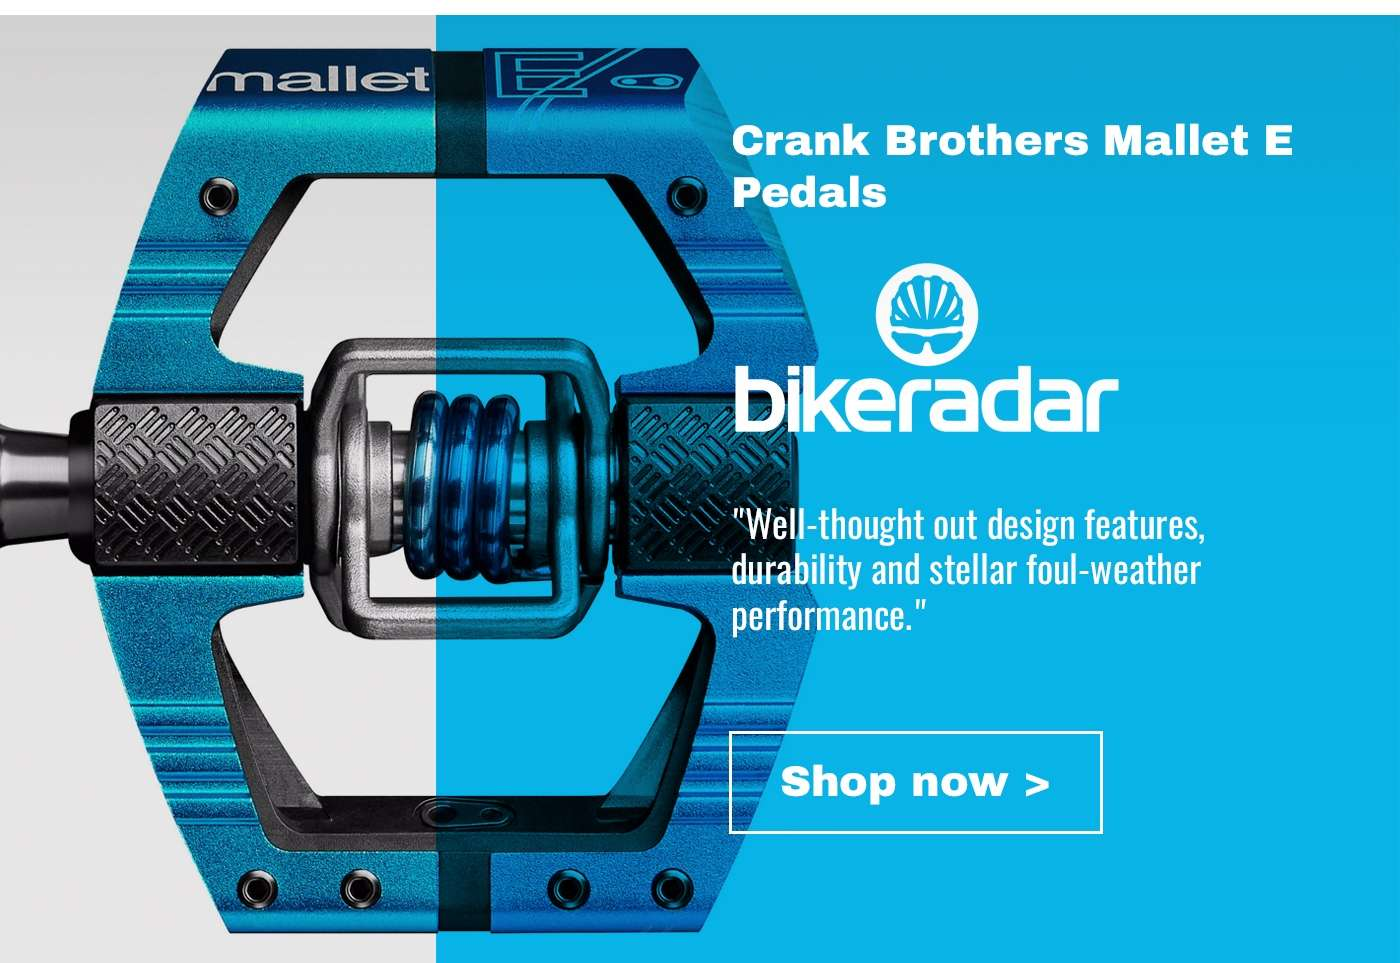 Crank Brothers Mallet E Pedals